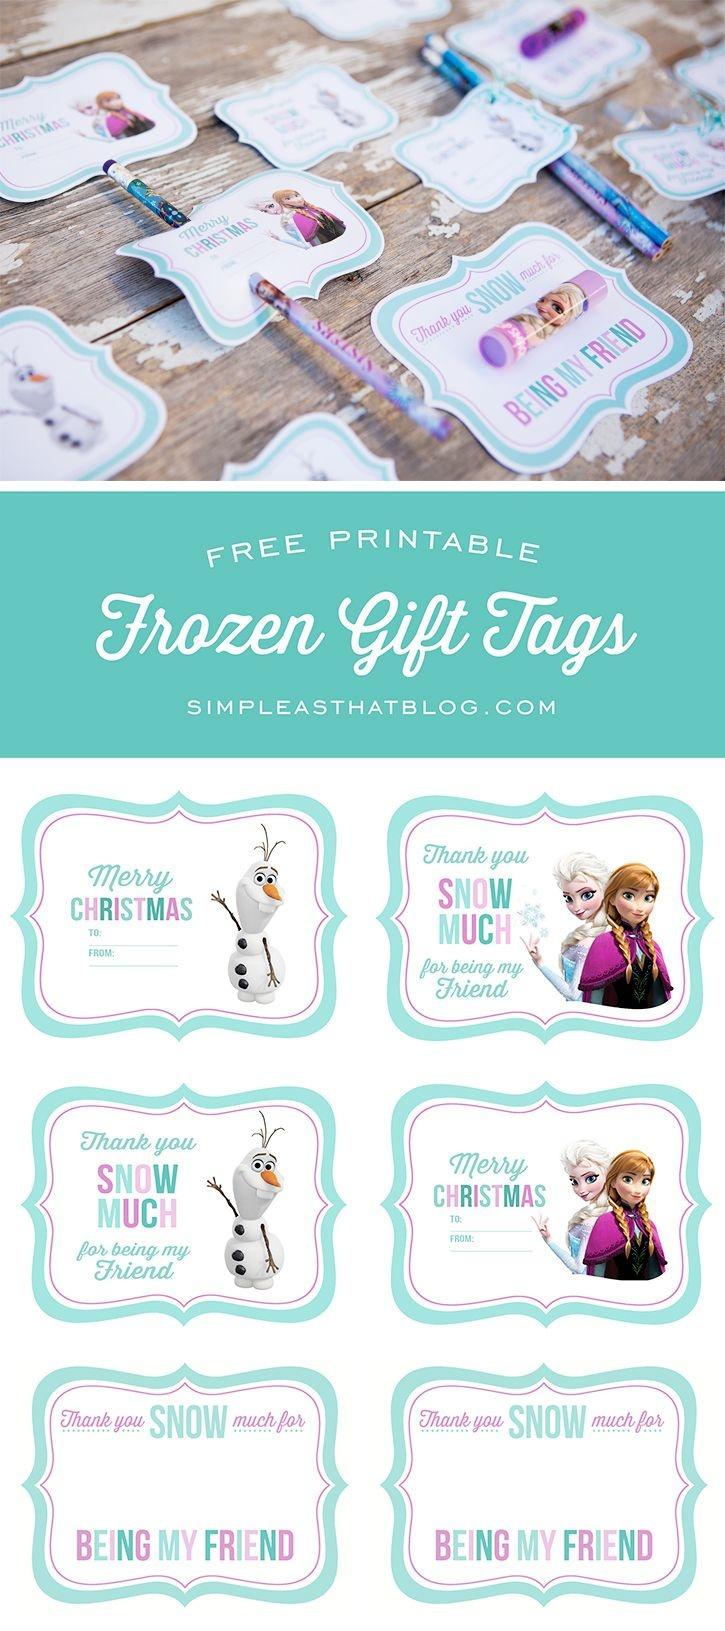 Free Printable Disney Frozen Gift Tags | Simple As That Printables - Free Online Gift Tags Printable